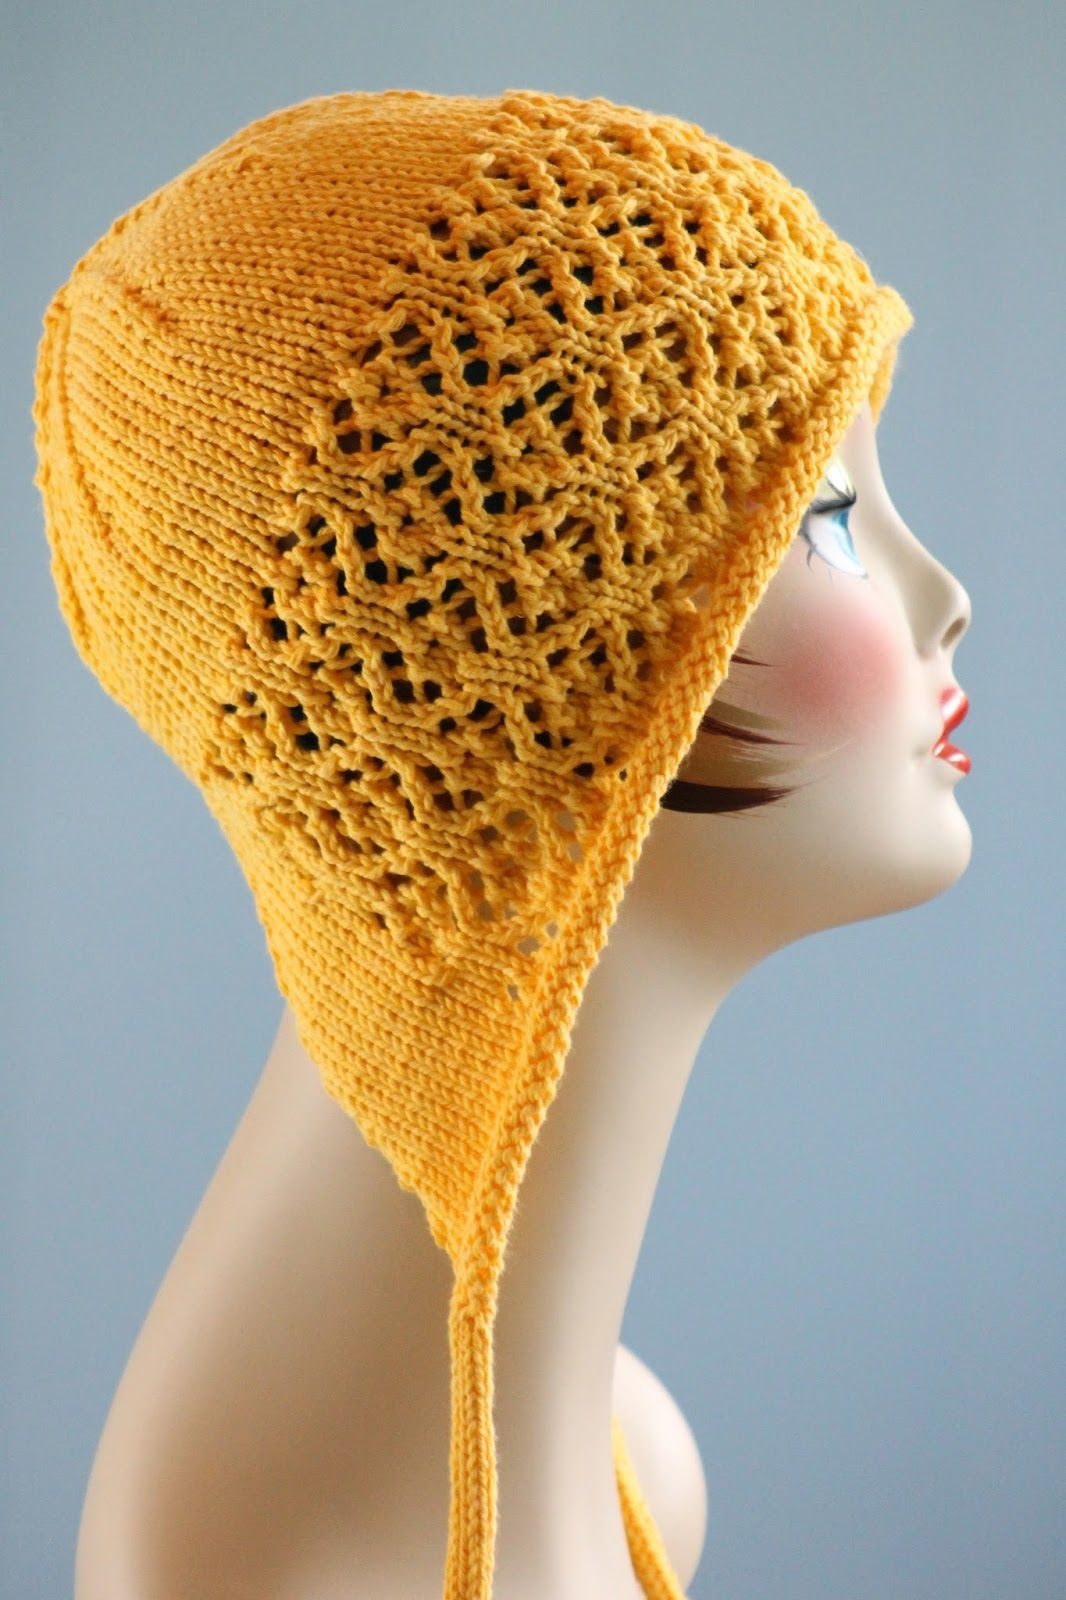 Floral Mesh Bonnet | Pinterest | Gorros, Patrones de tejido y Gorros ...